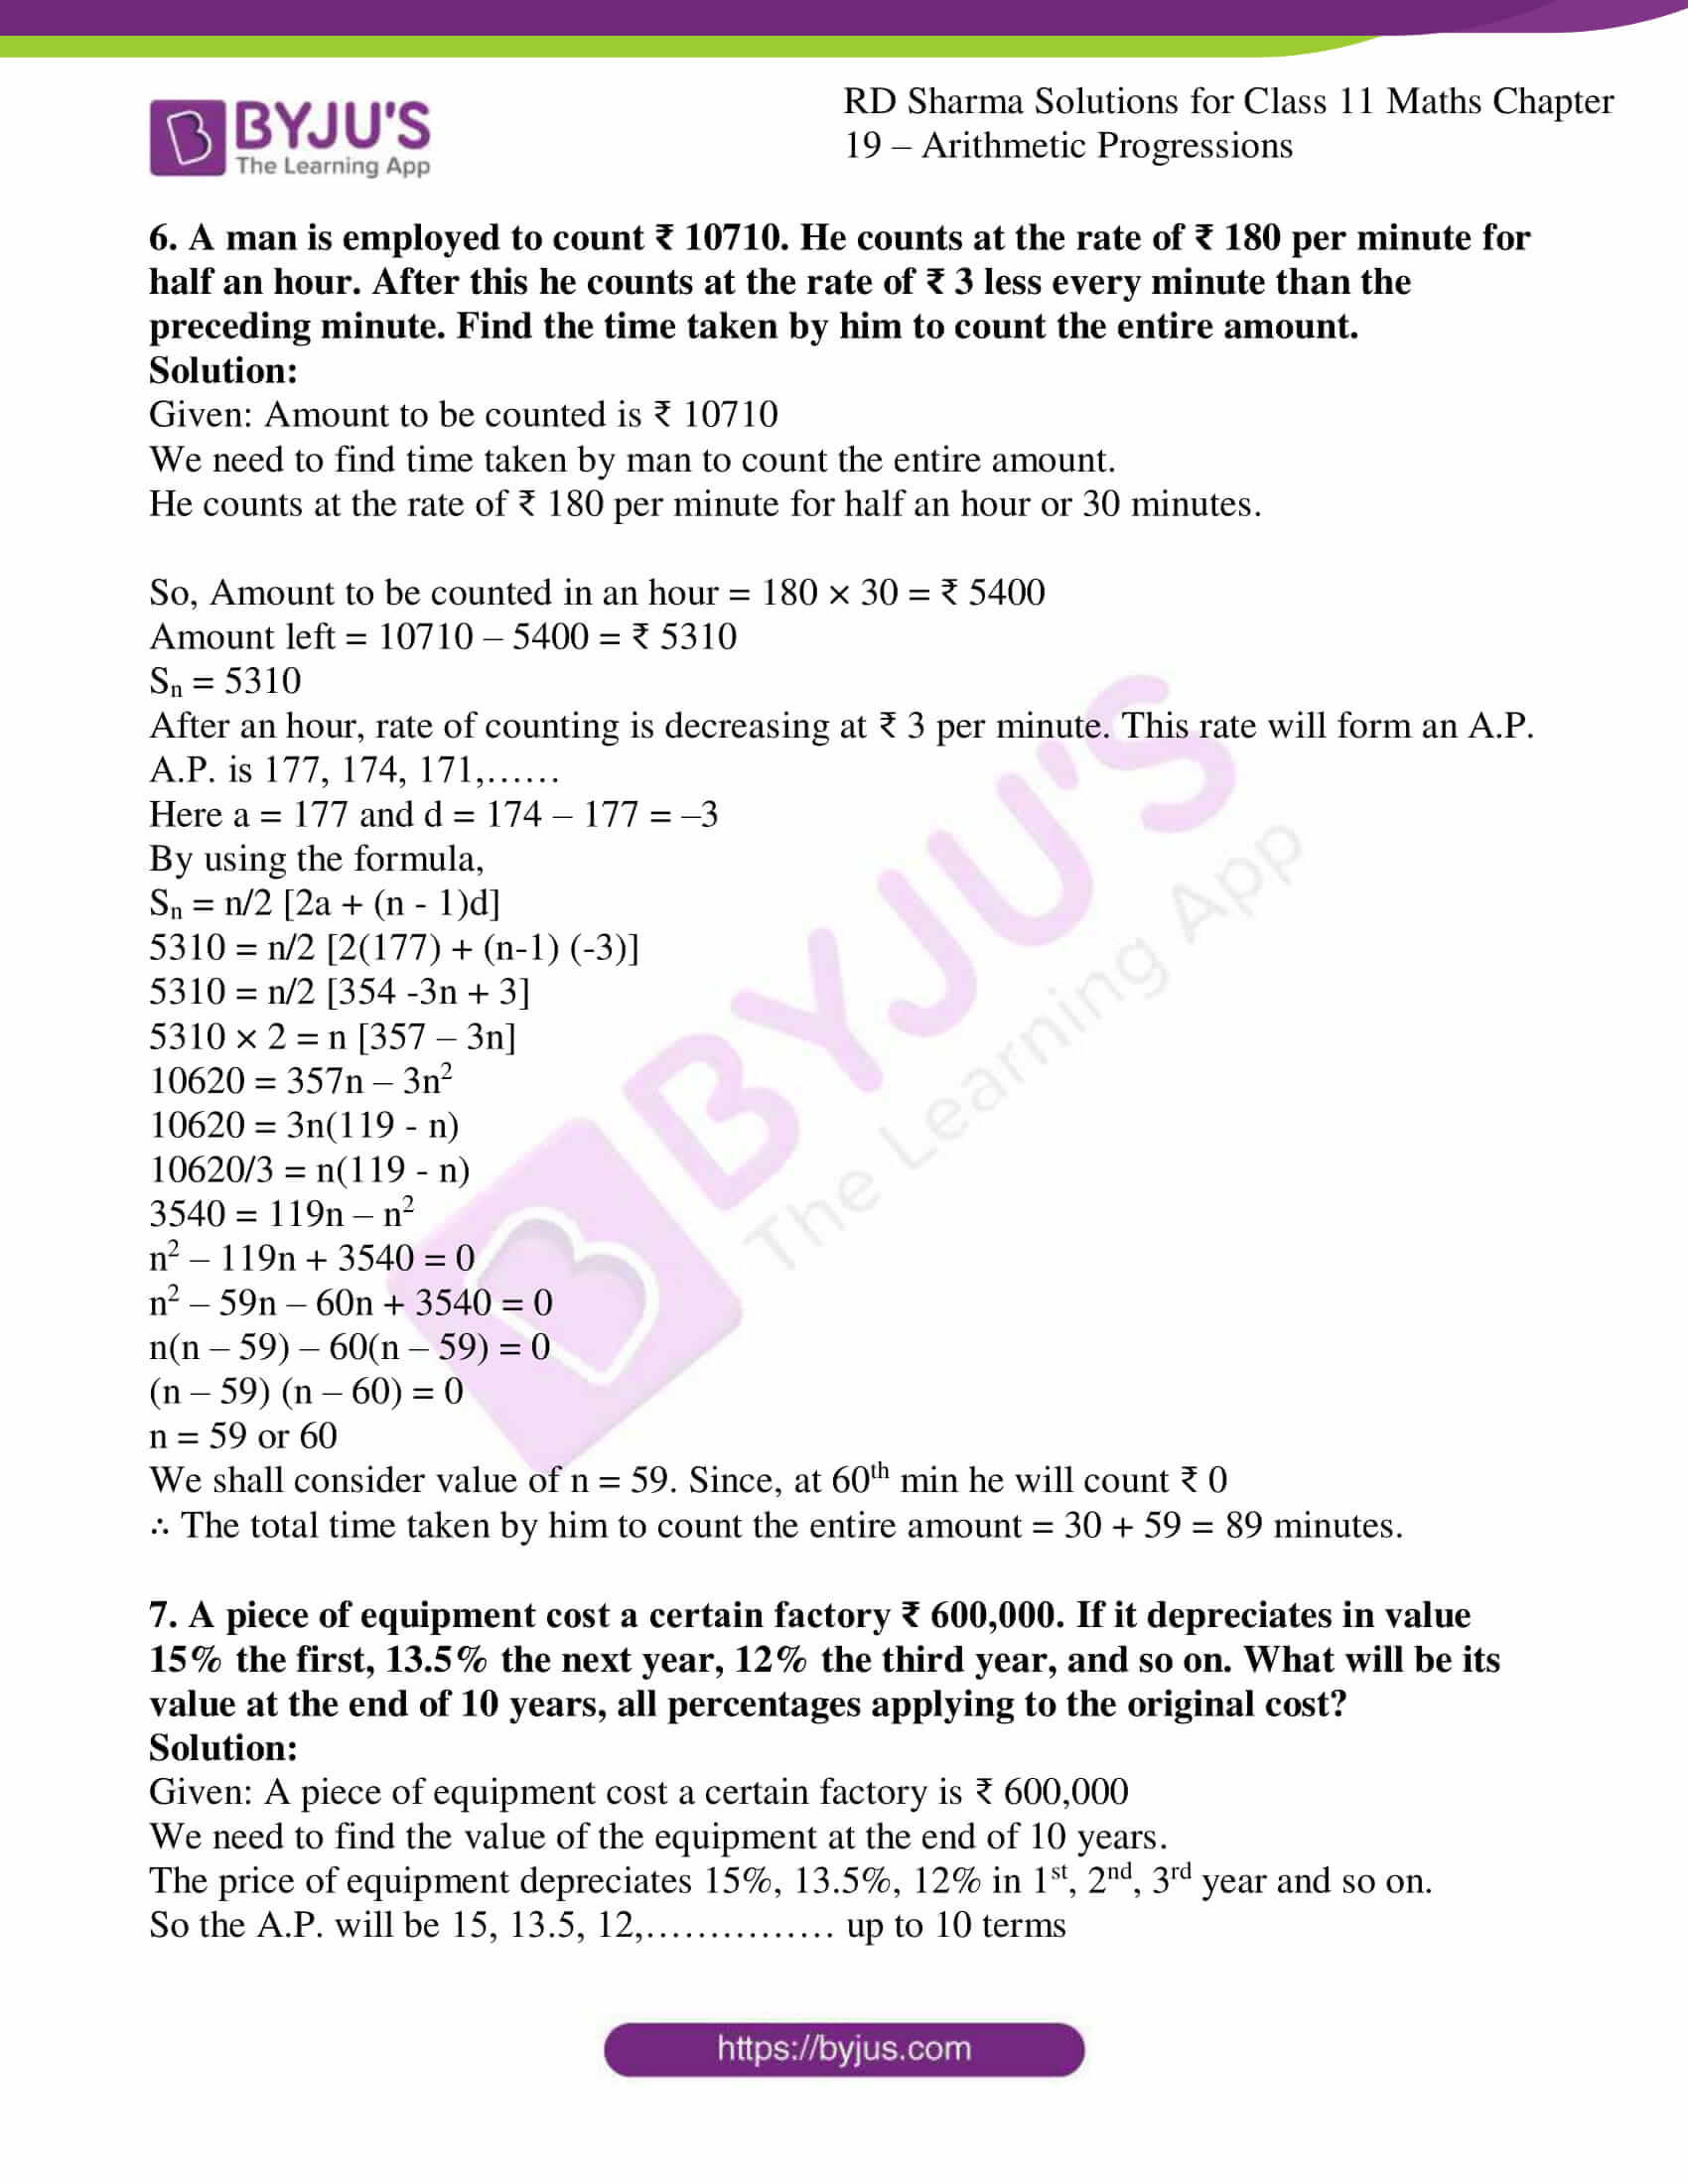 rd sharma class 11 maths ch 19 ex 7 6